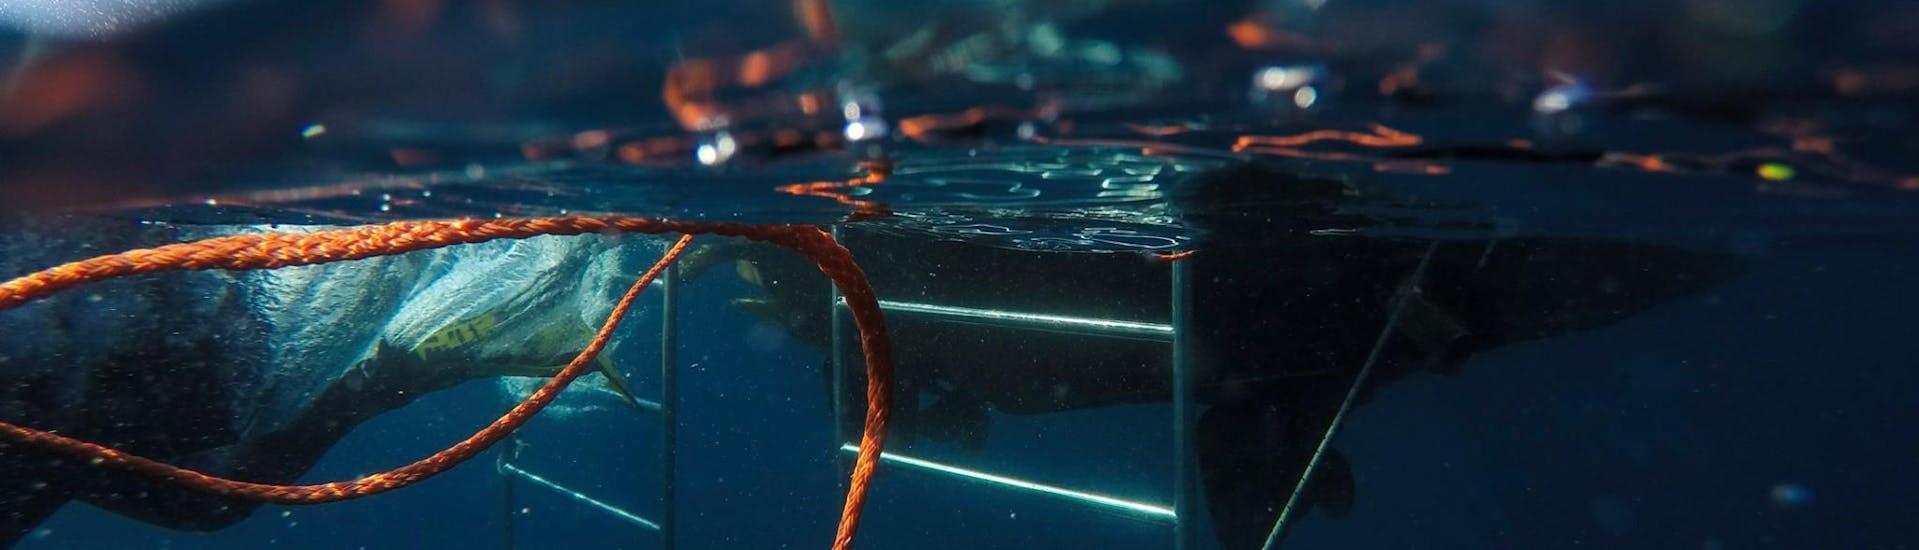 Wreck Diving in Premantura Incl. U- 82, Rossarol, Golub with Dive Center Scuba Libre Premantura - Hero image